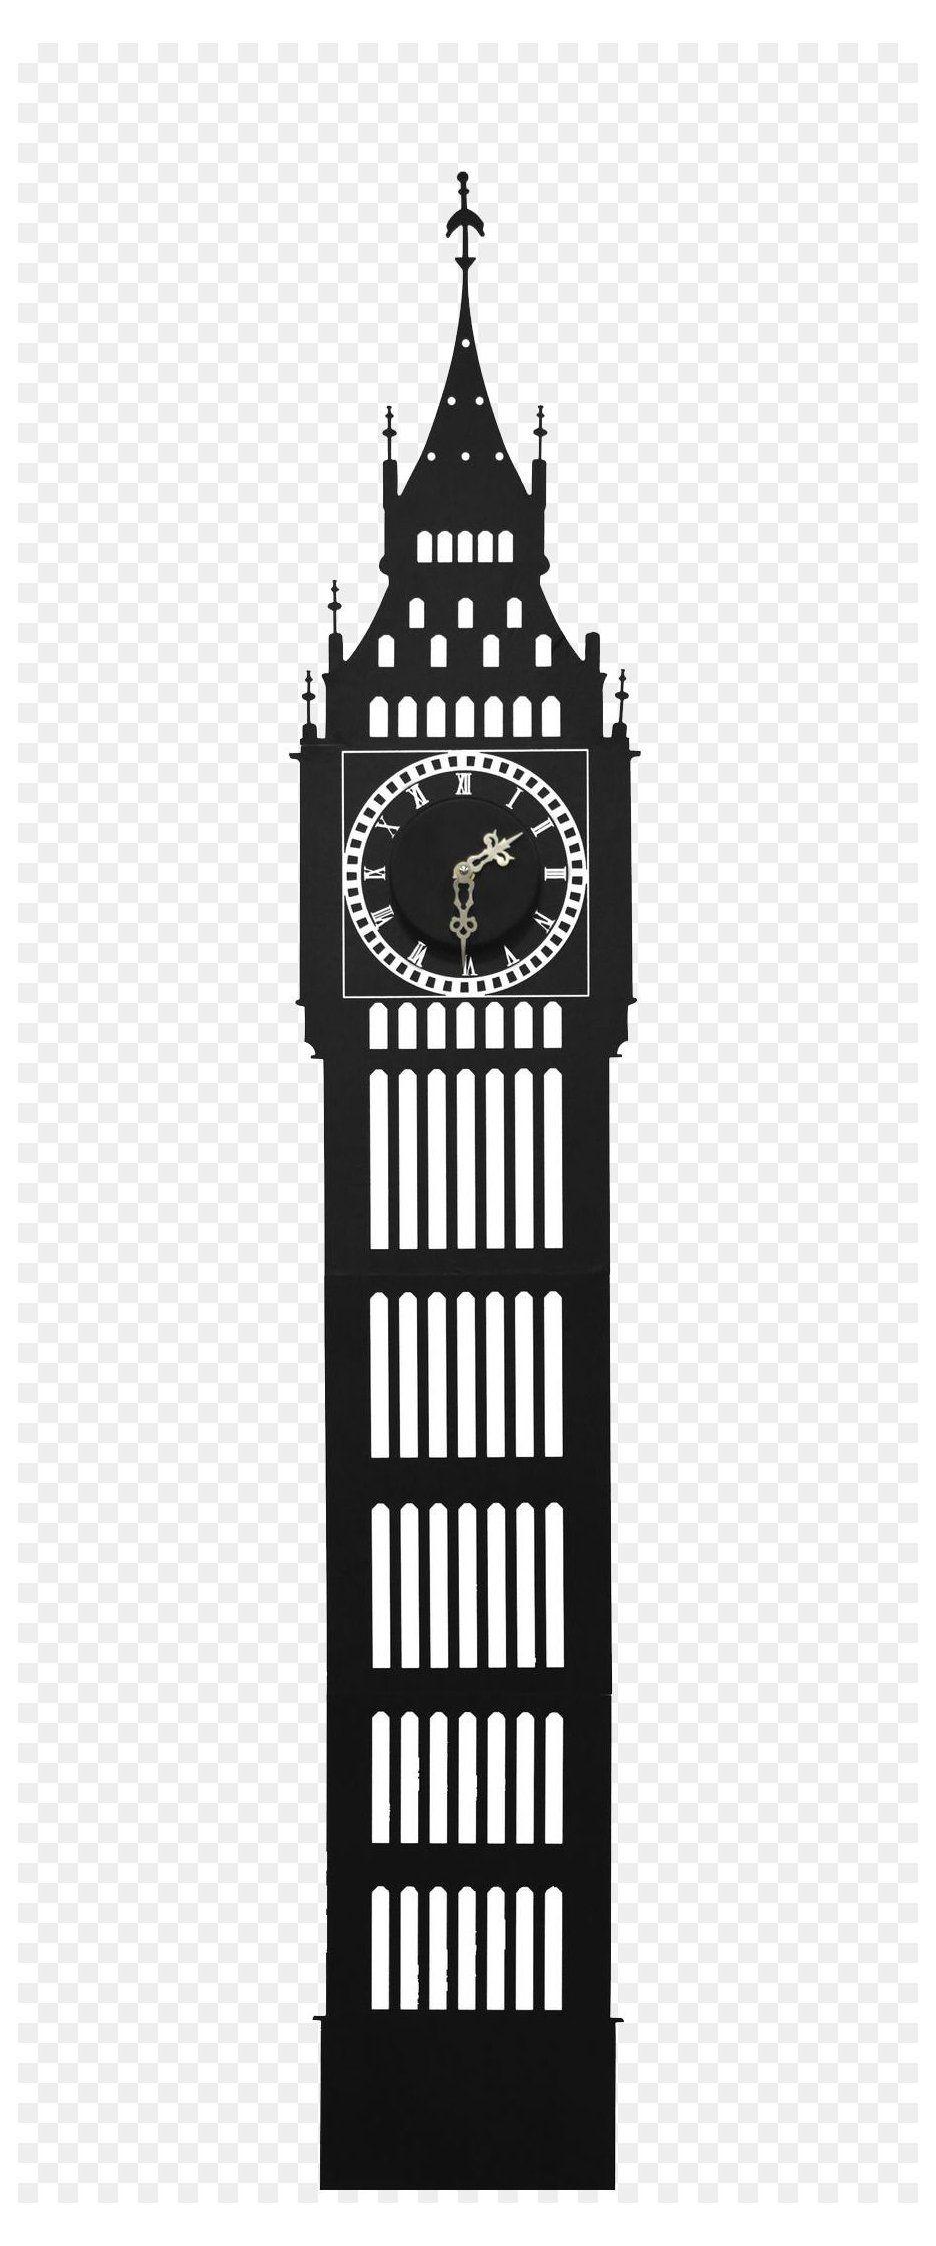 Pin By Tb On British Party 2021 Big Ben Art Big Ben Drawing Big Ben Artwork